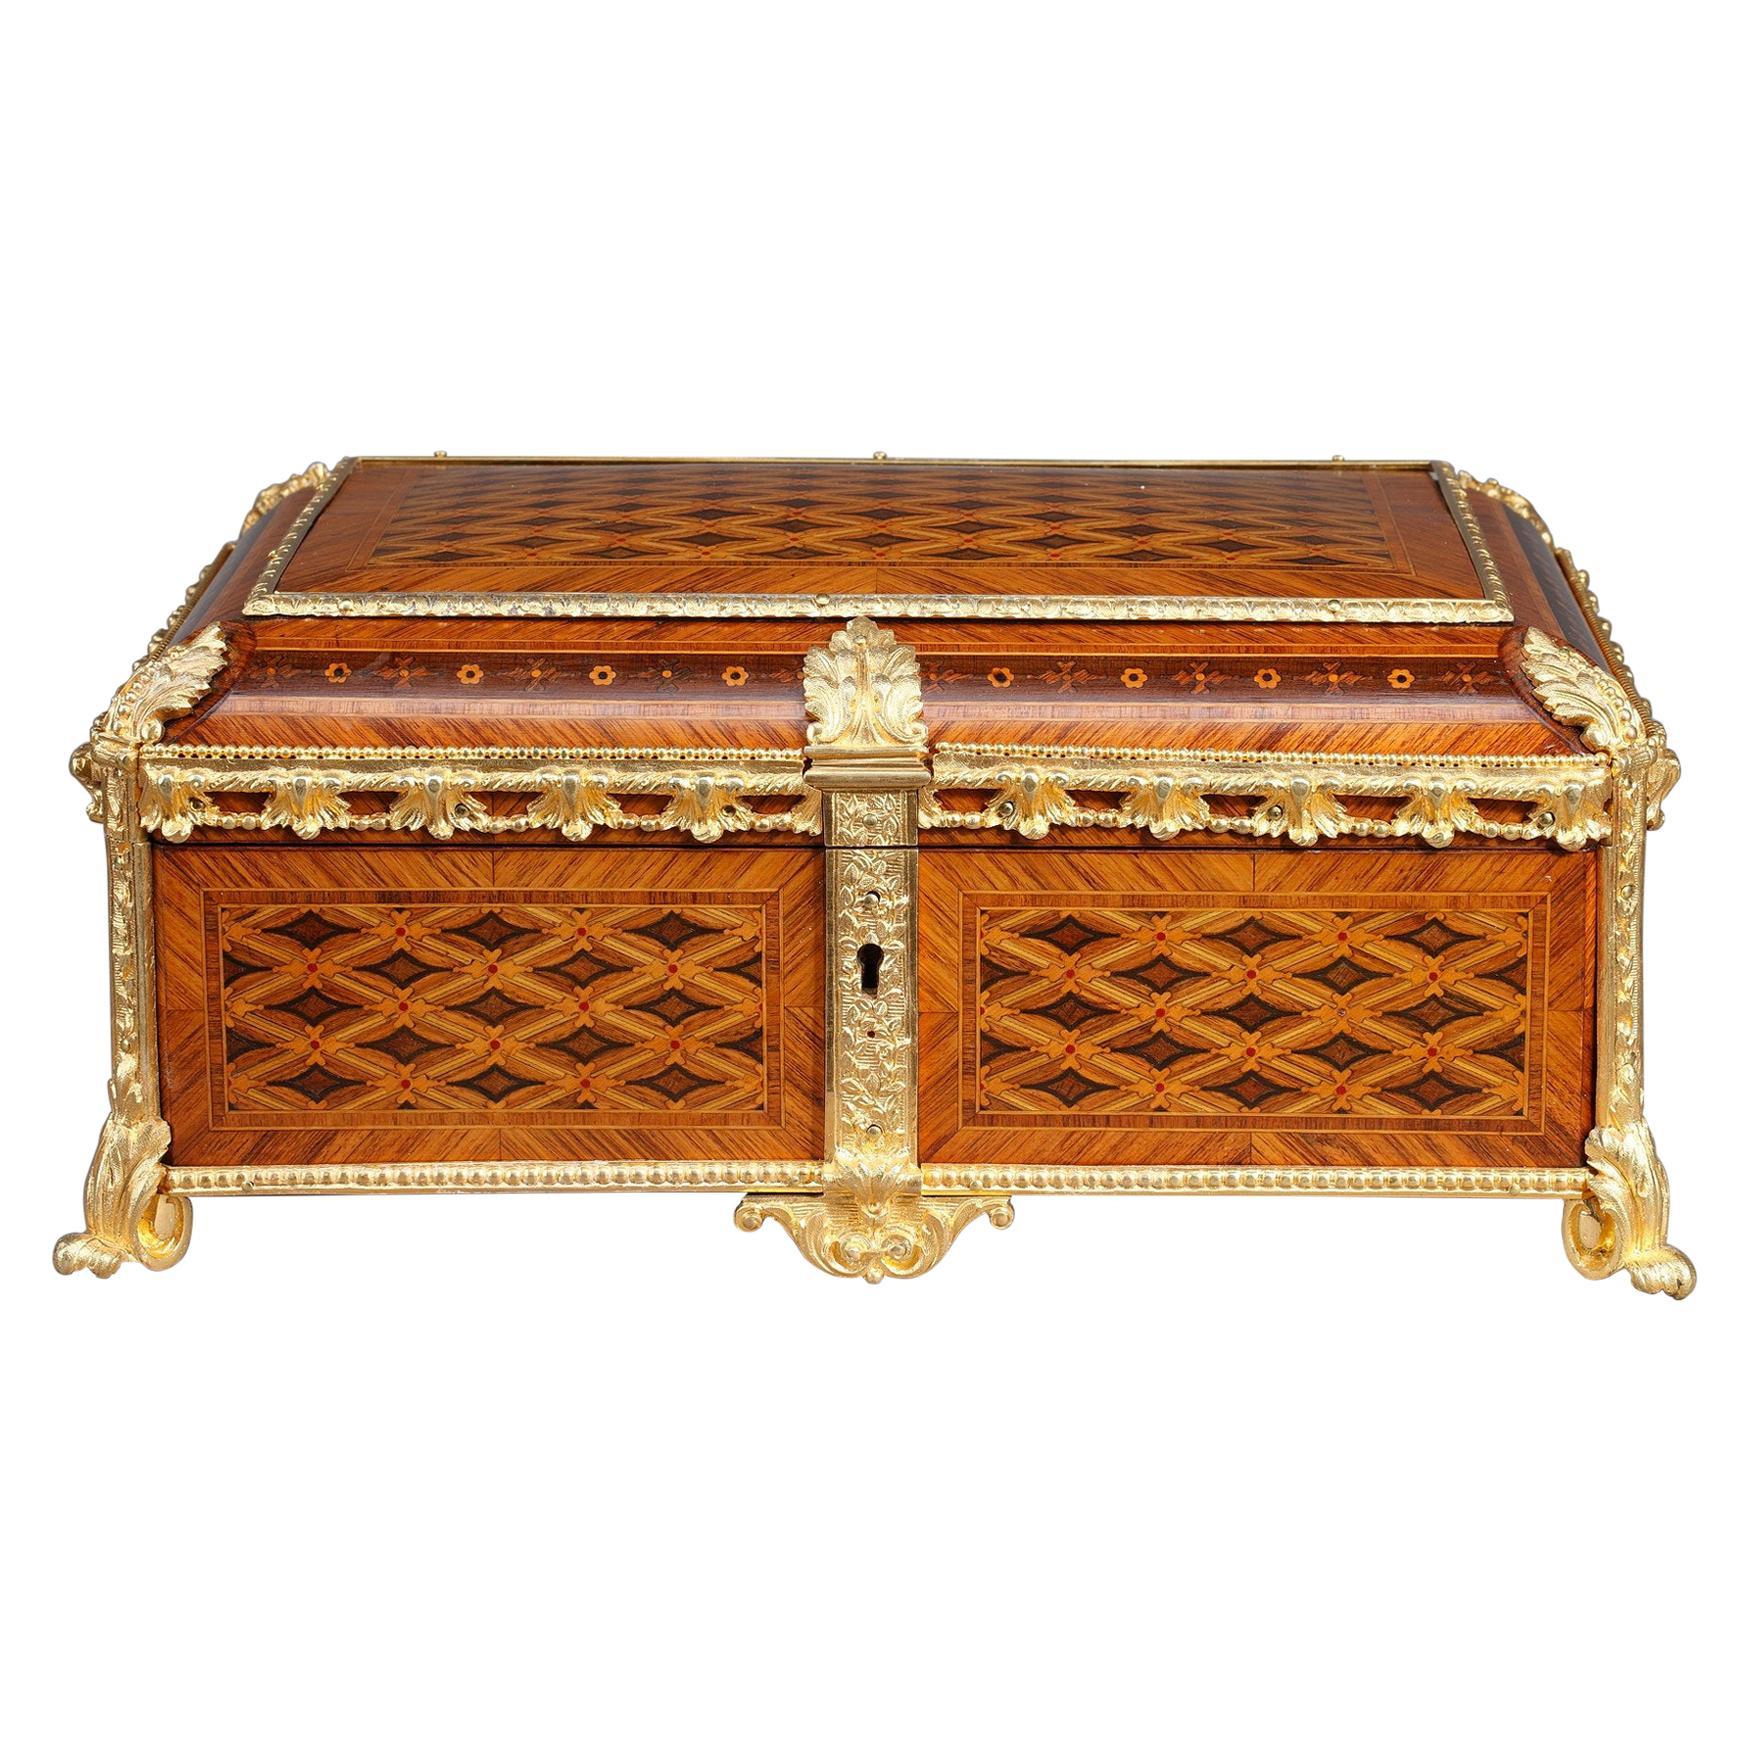 19th Century Louis XVI-Style Marquetry Jewelry Box